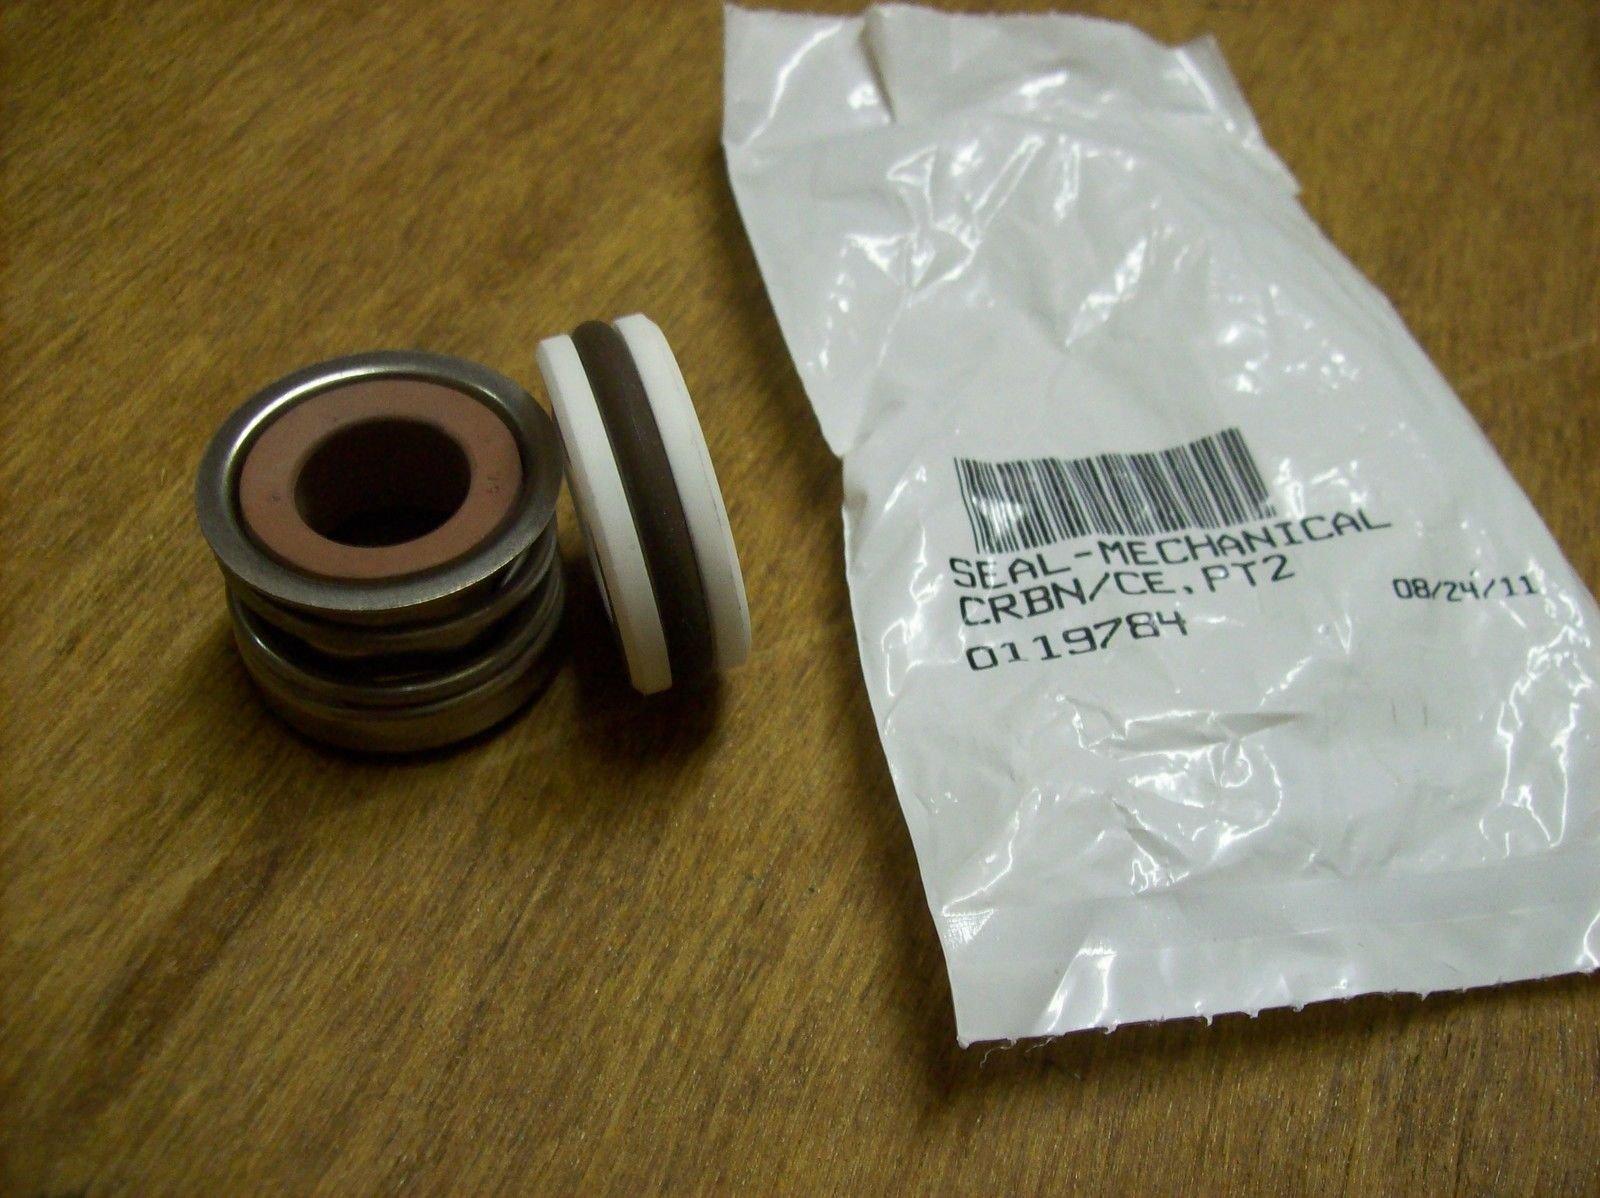 Wacker Neuson Wacker Trash Pump Mechanical Seal Fits New Style PT2, PT2A, PT2H, PT2V